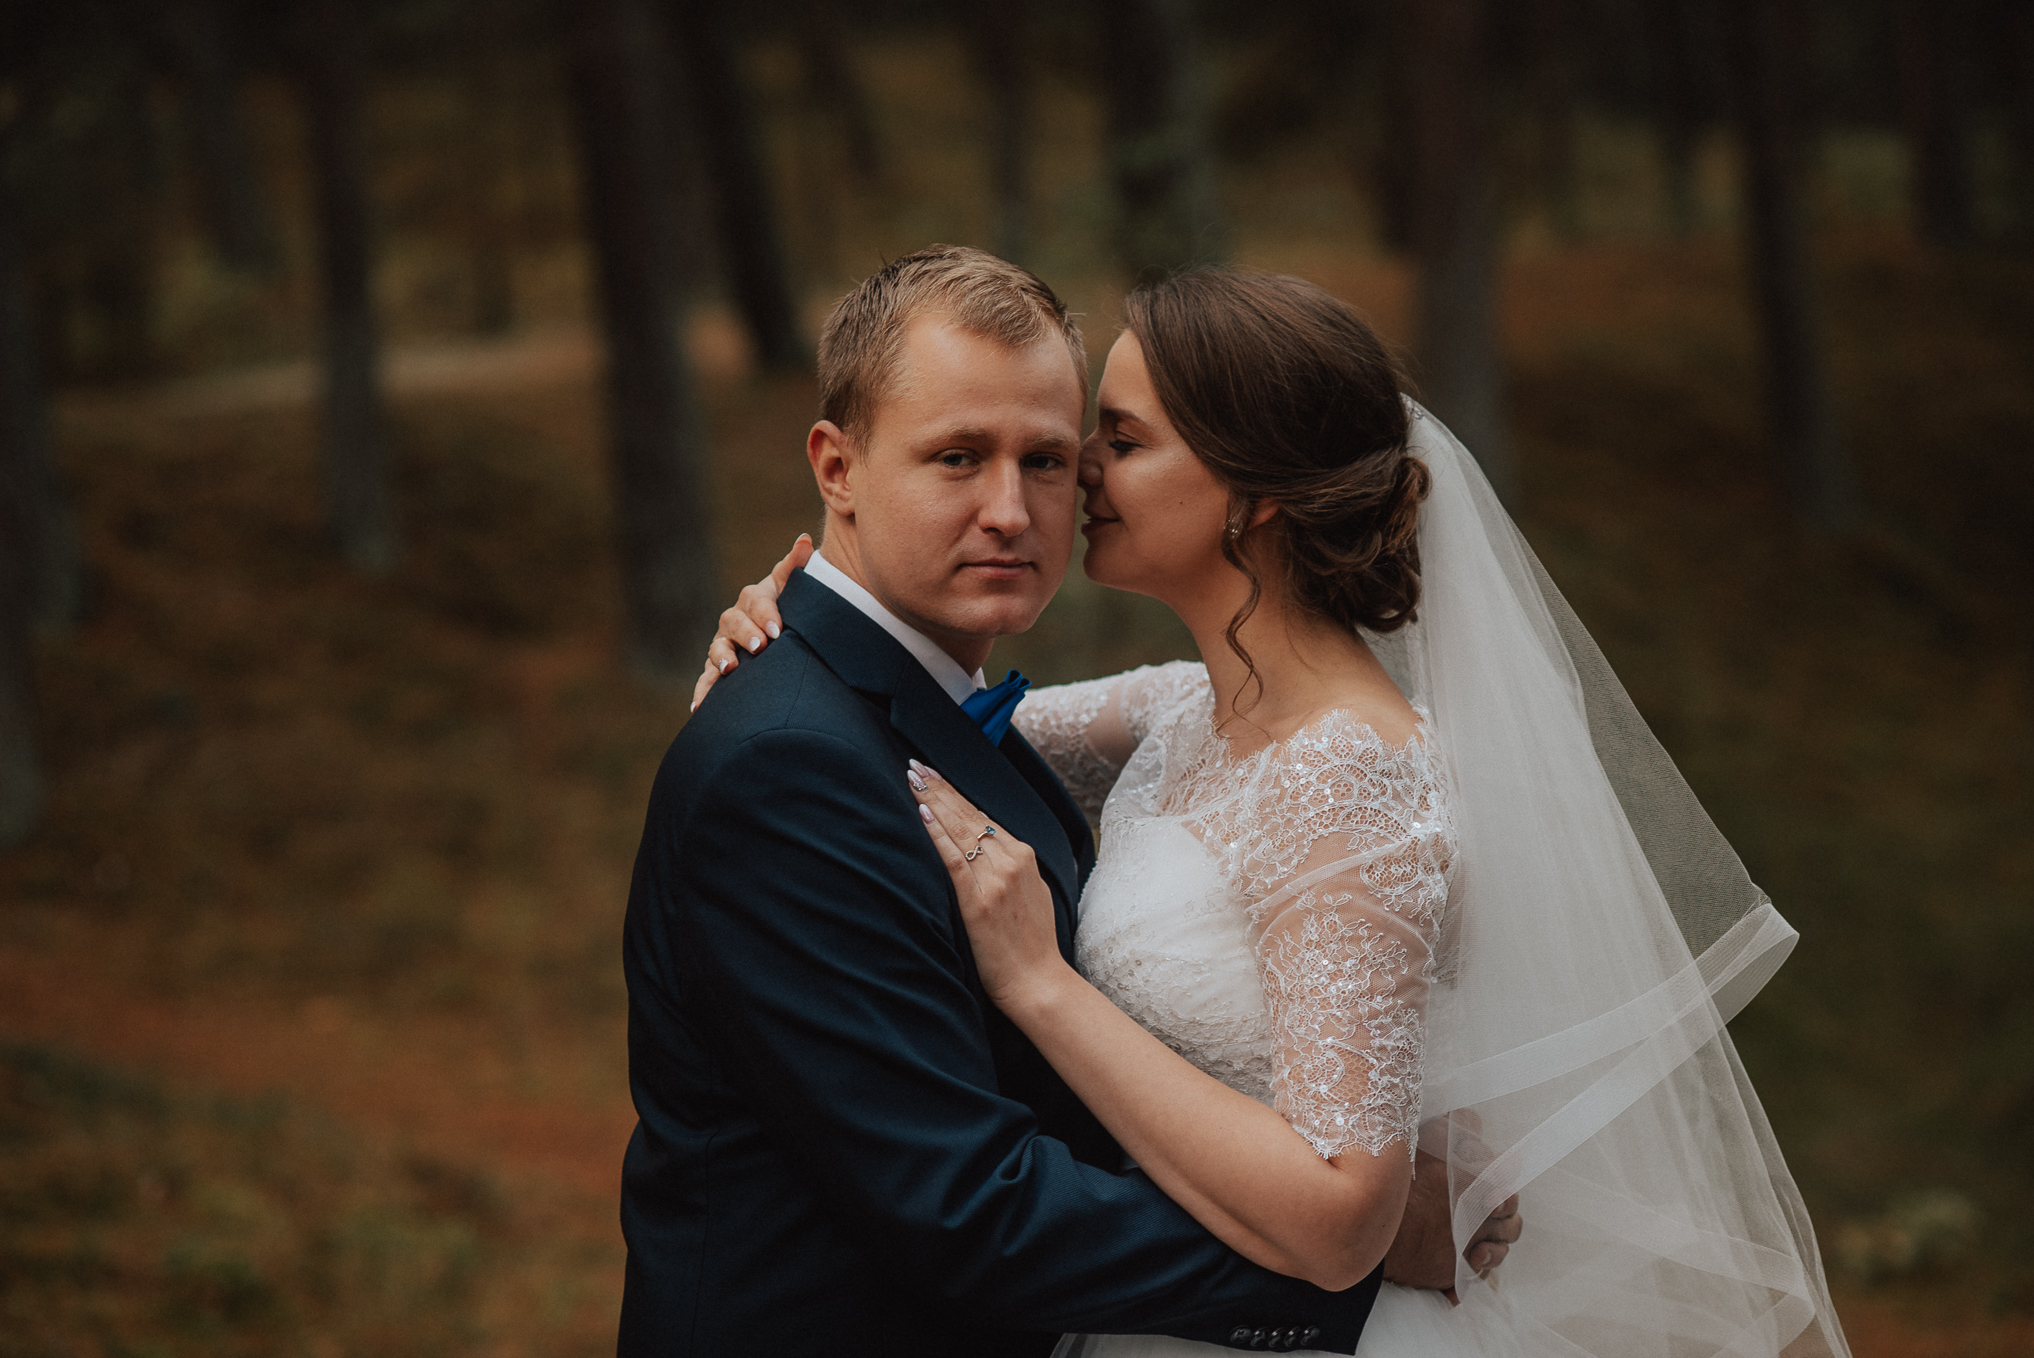 Leśna sesja ślubna 2